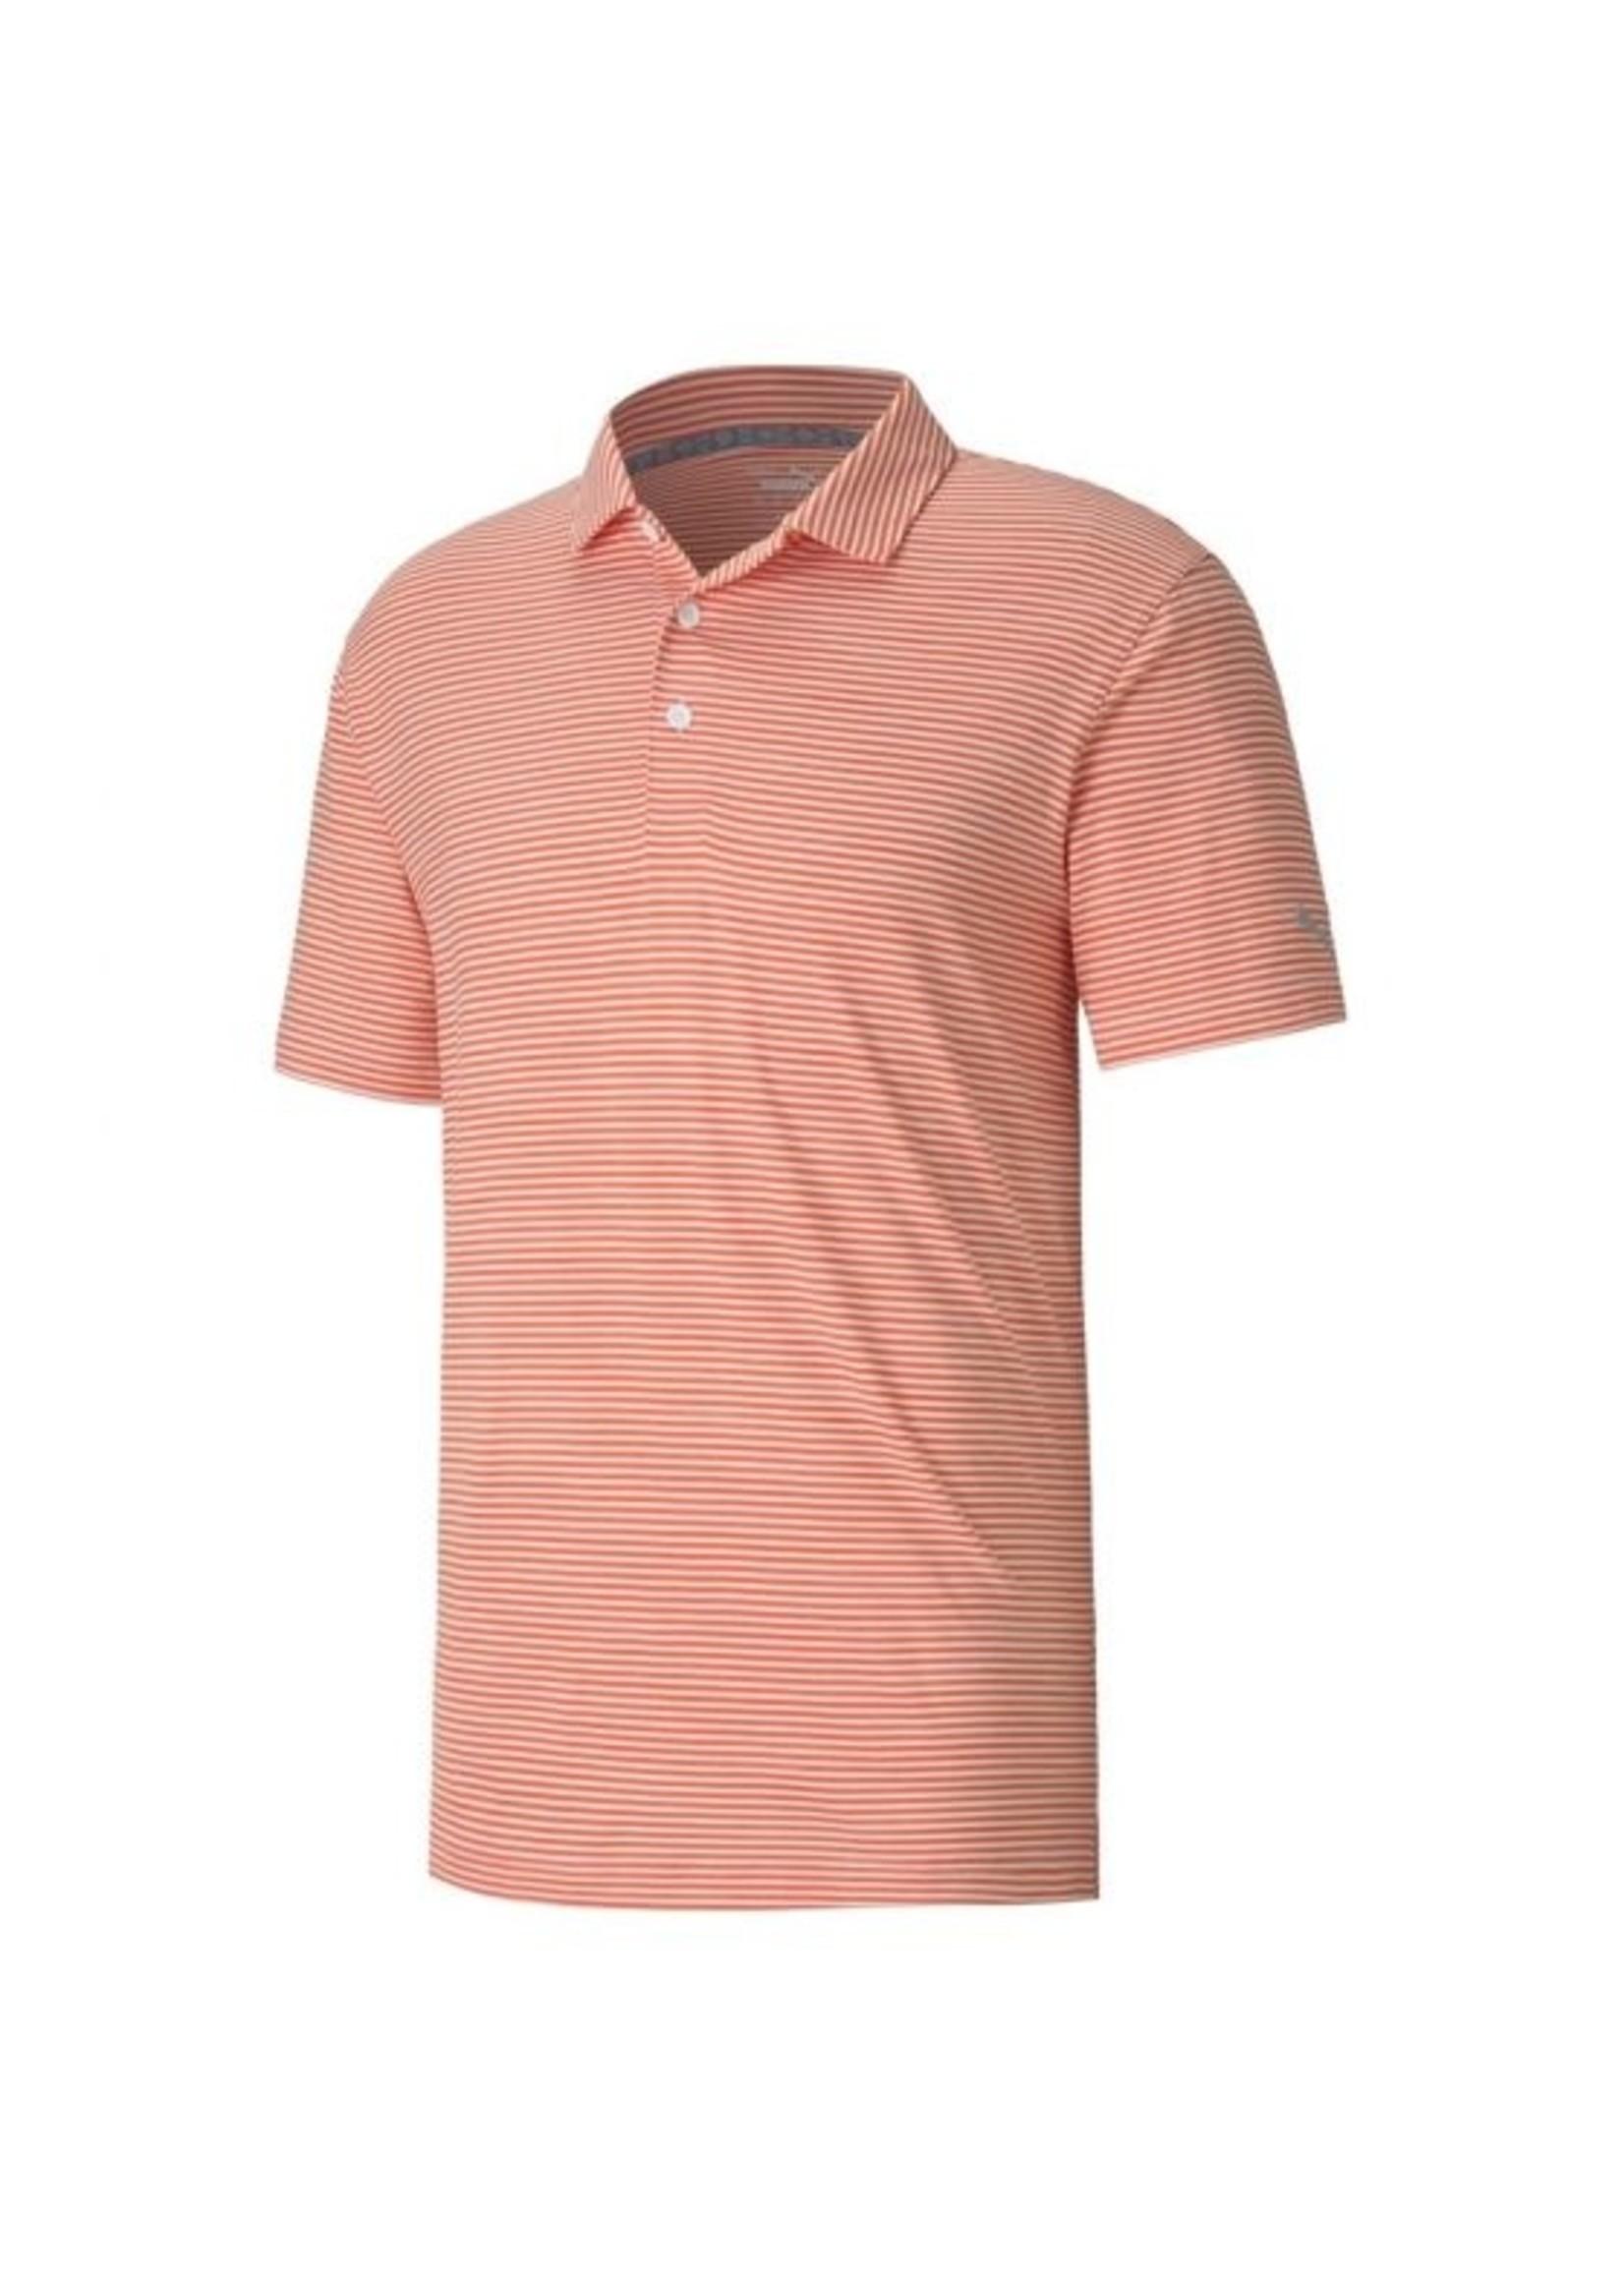 PUMA KINGSWELL GLEN Caddie Polo Golf Shirt Mens